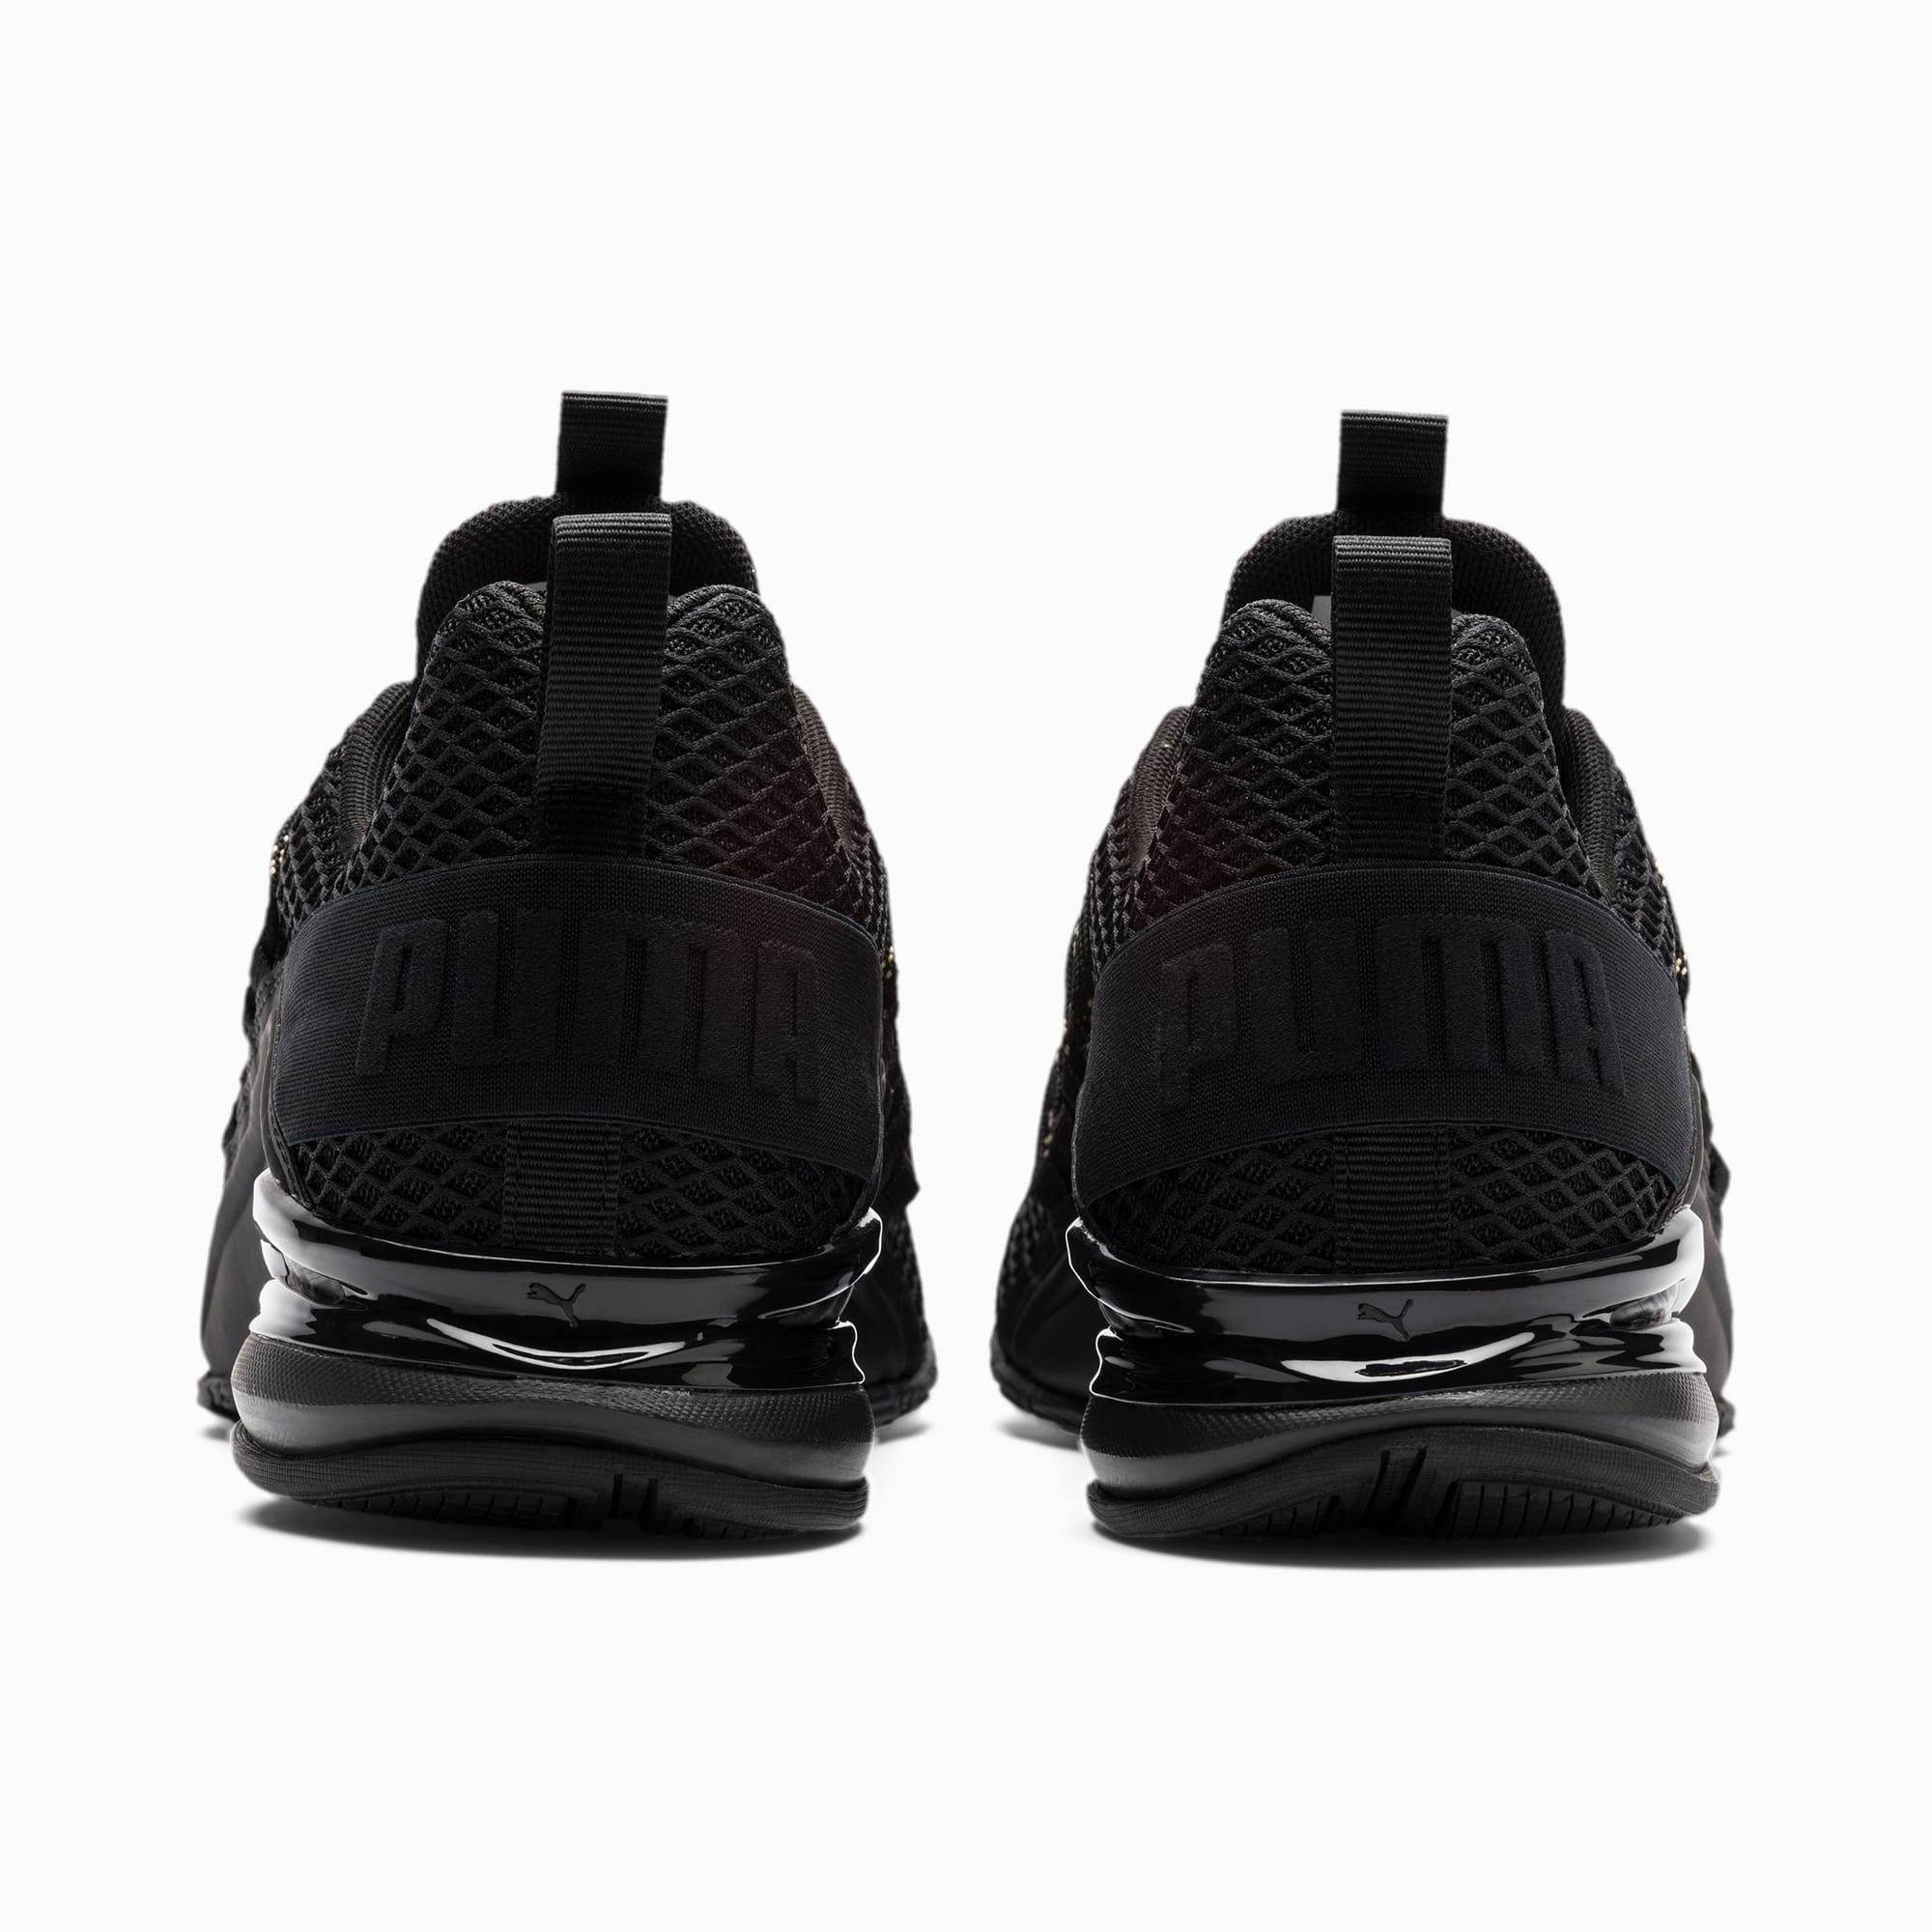 Axelion Spark Men's Running Shoes